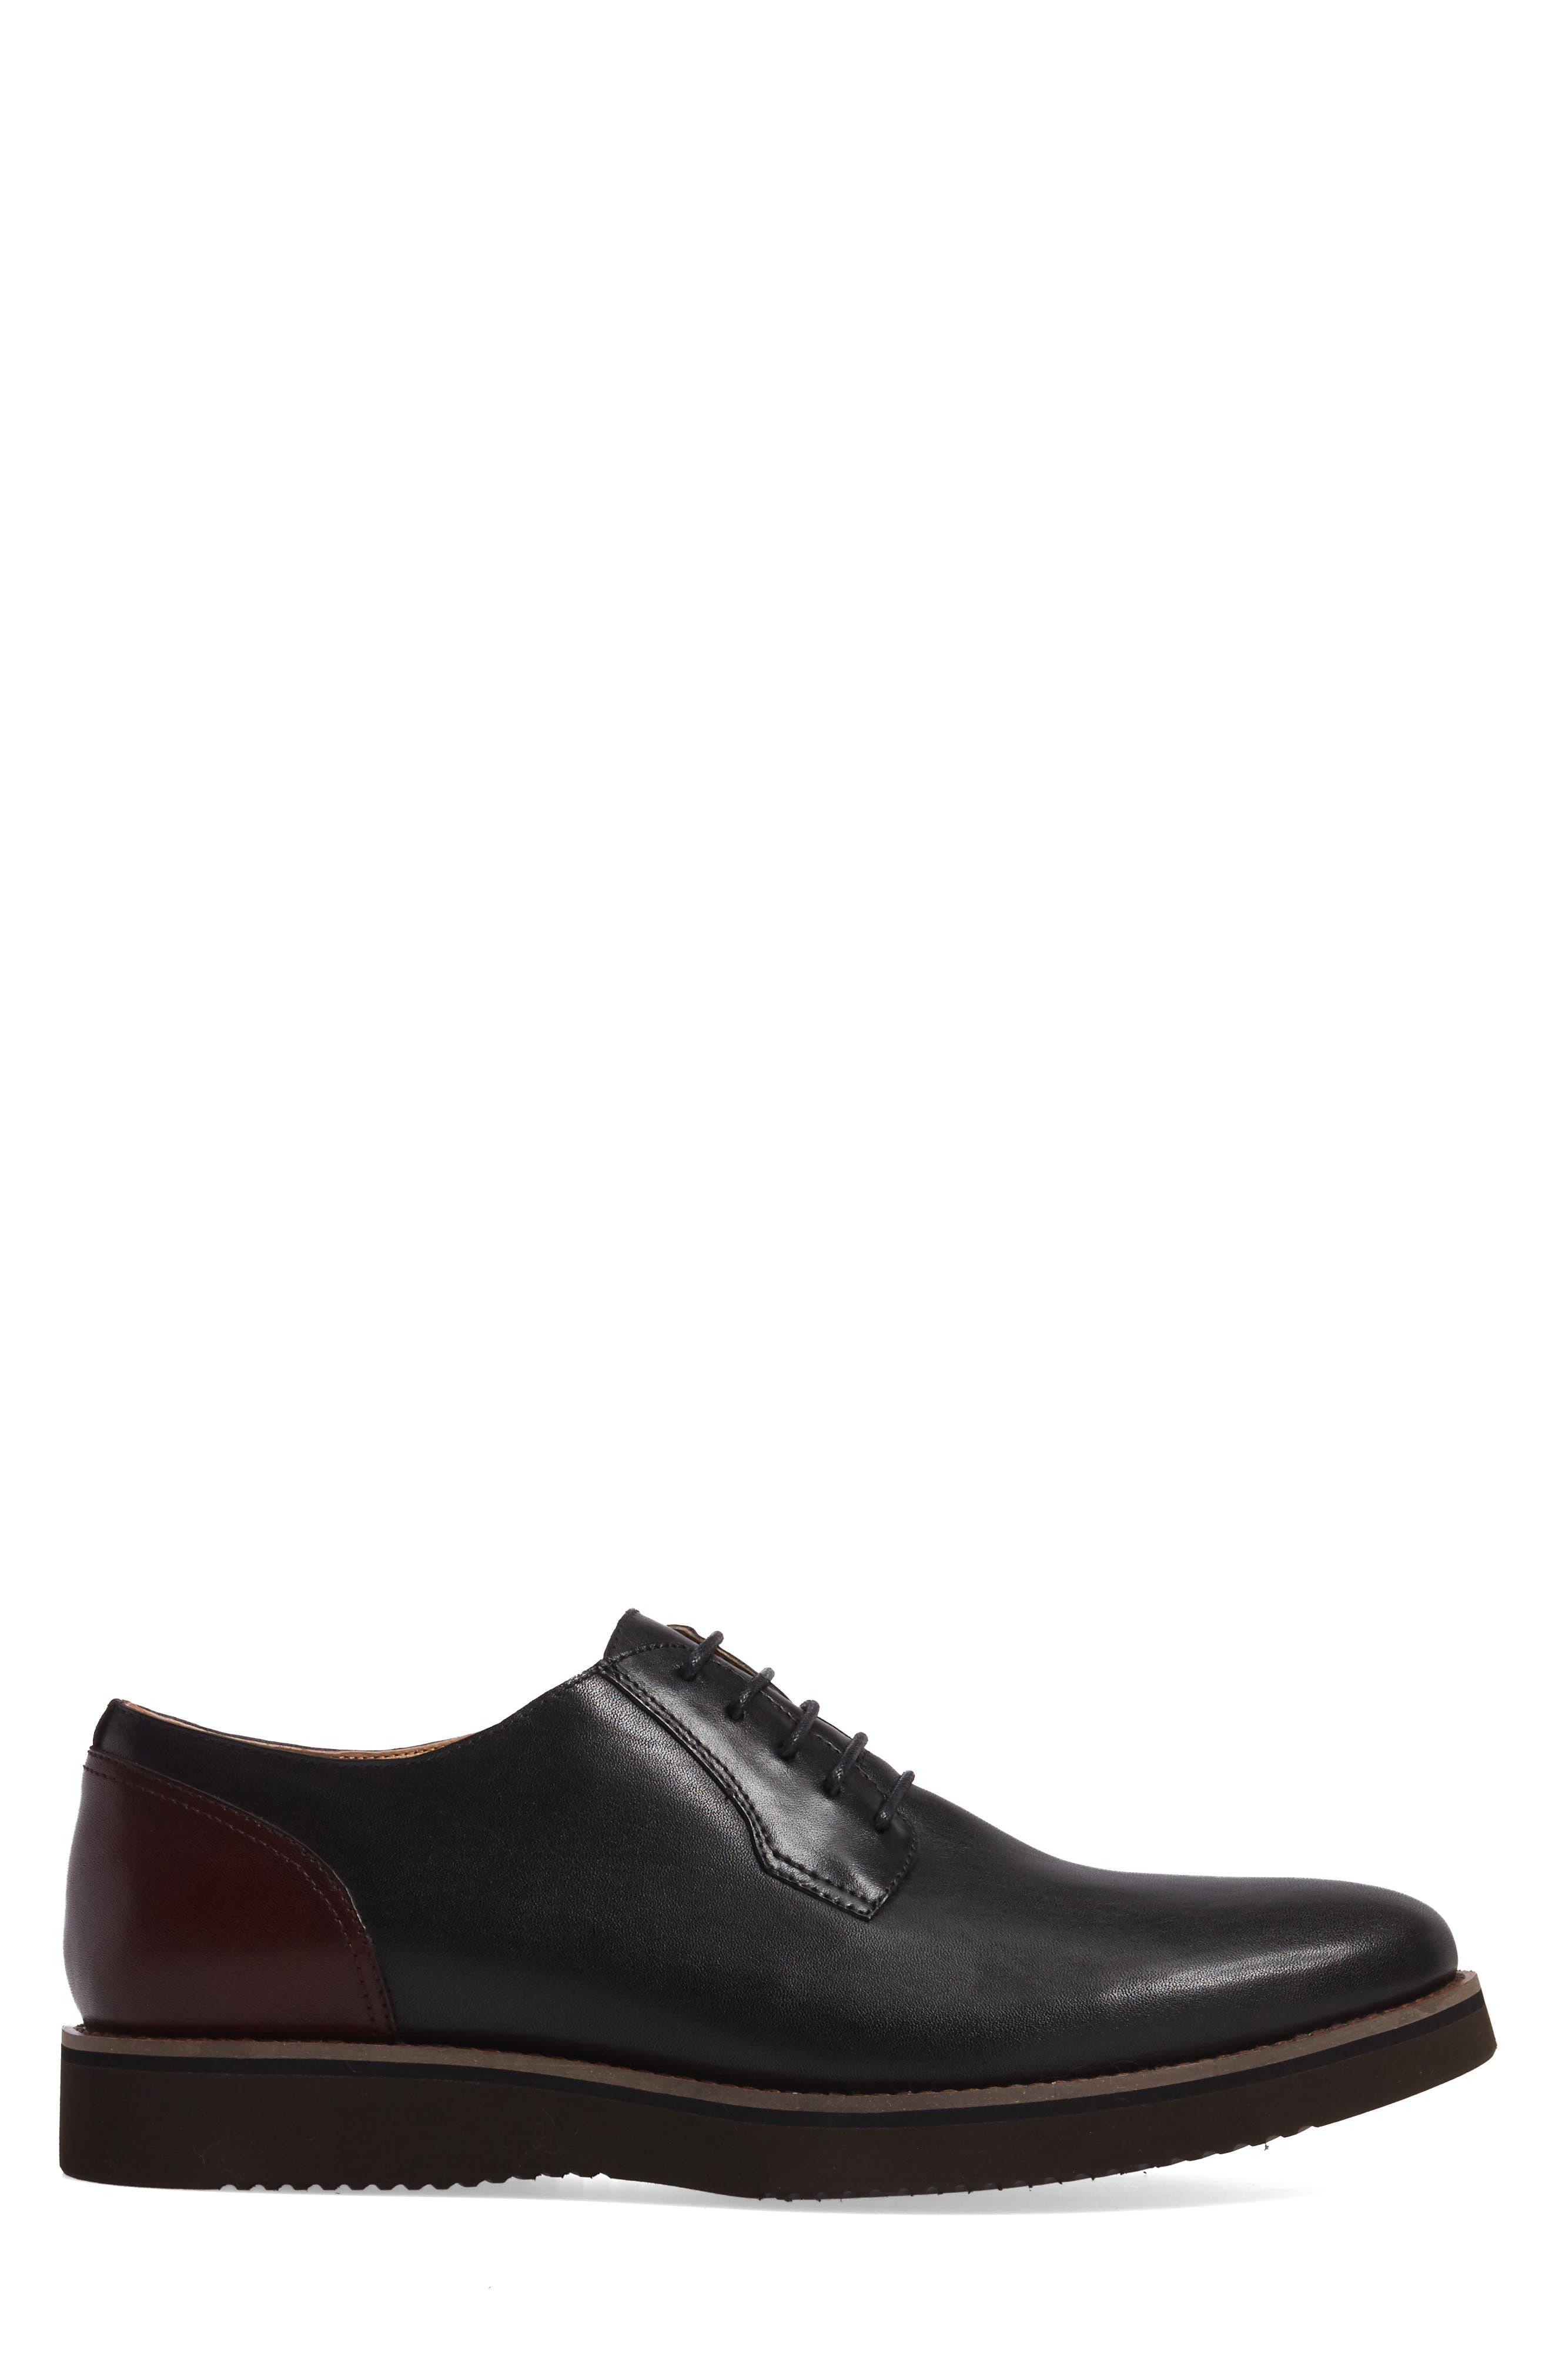 Saxon Plain Toe Derby,                             Alternate thumbnail 3, color,                             Black Leather